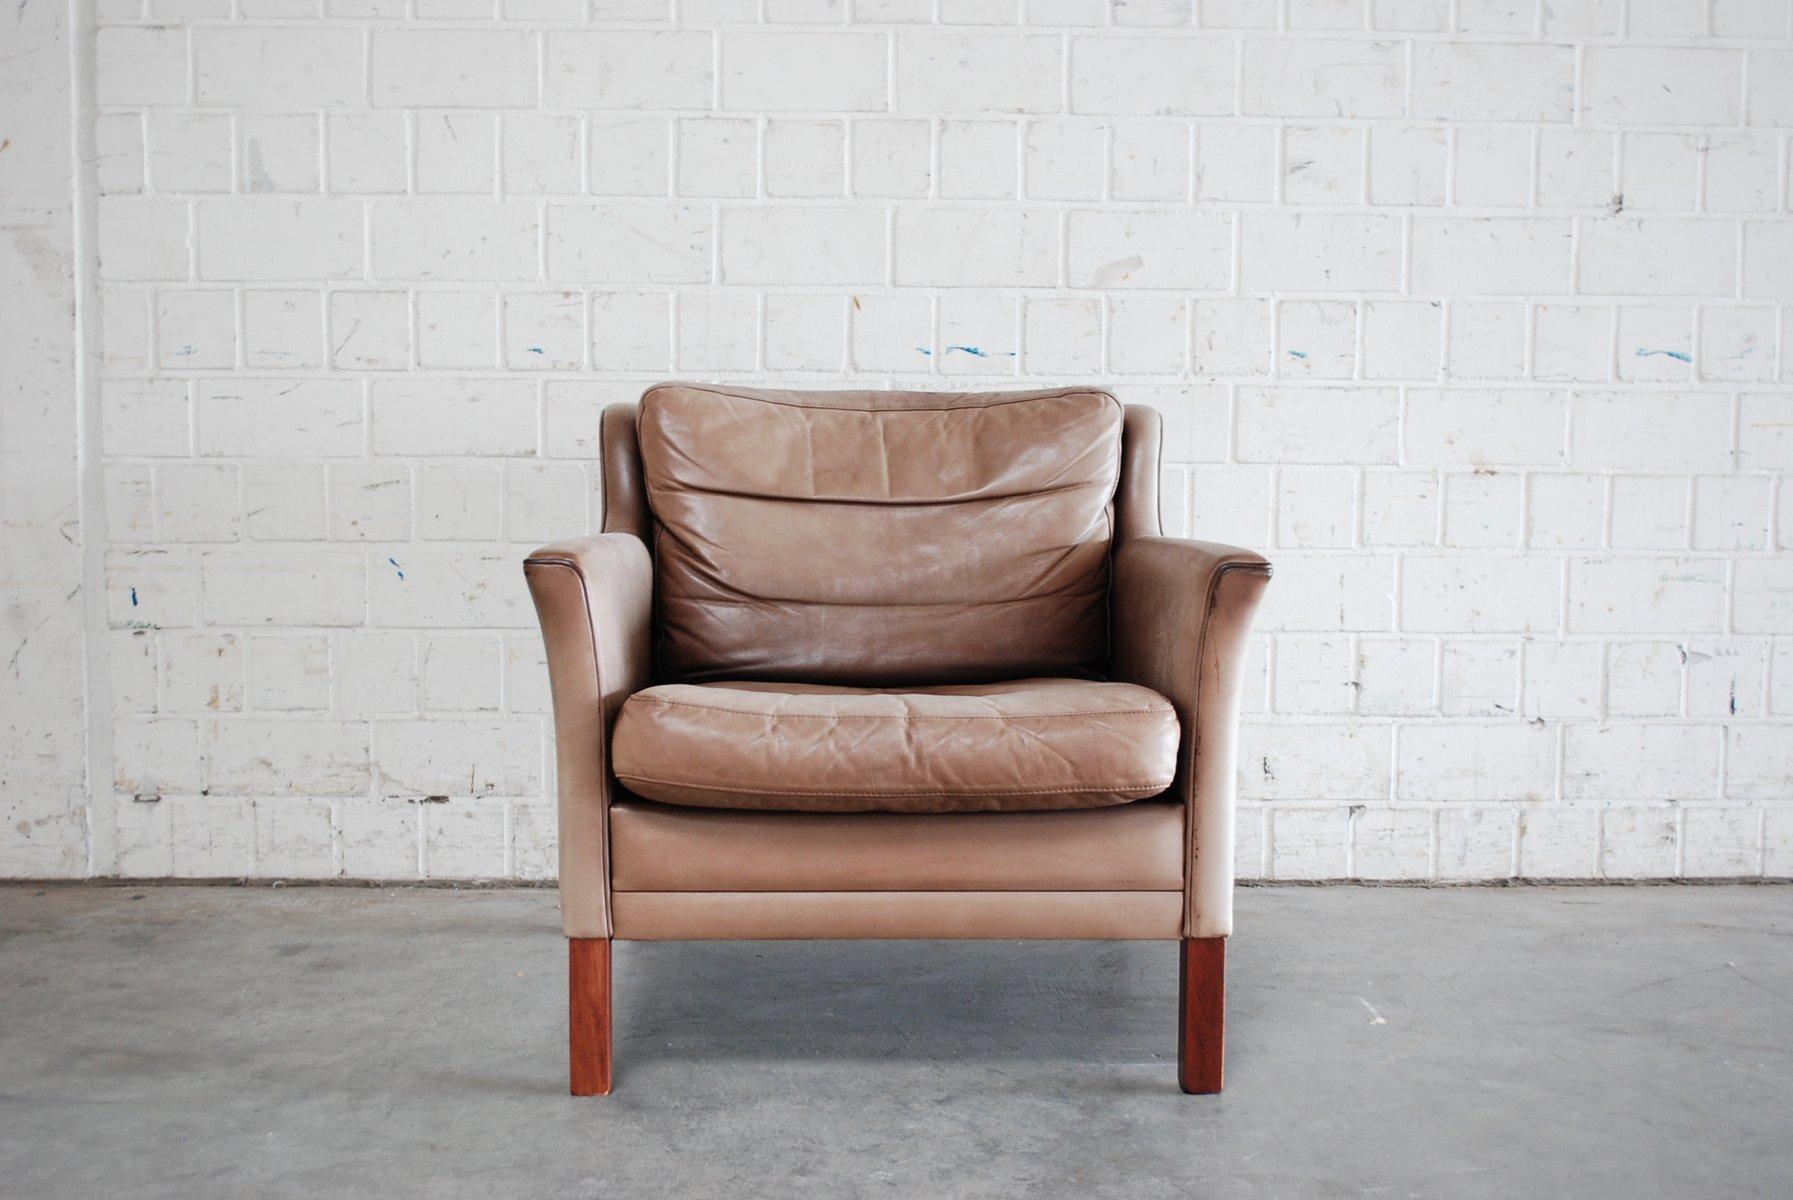 d nischer lounge stuhl aus leder buchenholz bei pamono. Black Bedroom Furniture Sets. Home Design Ideas